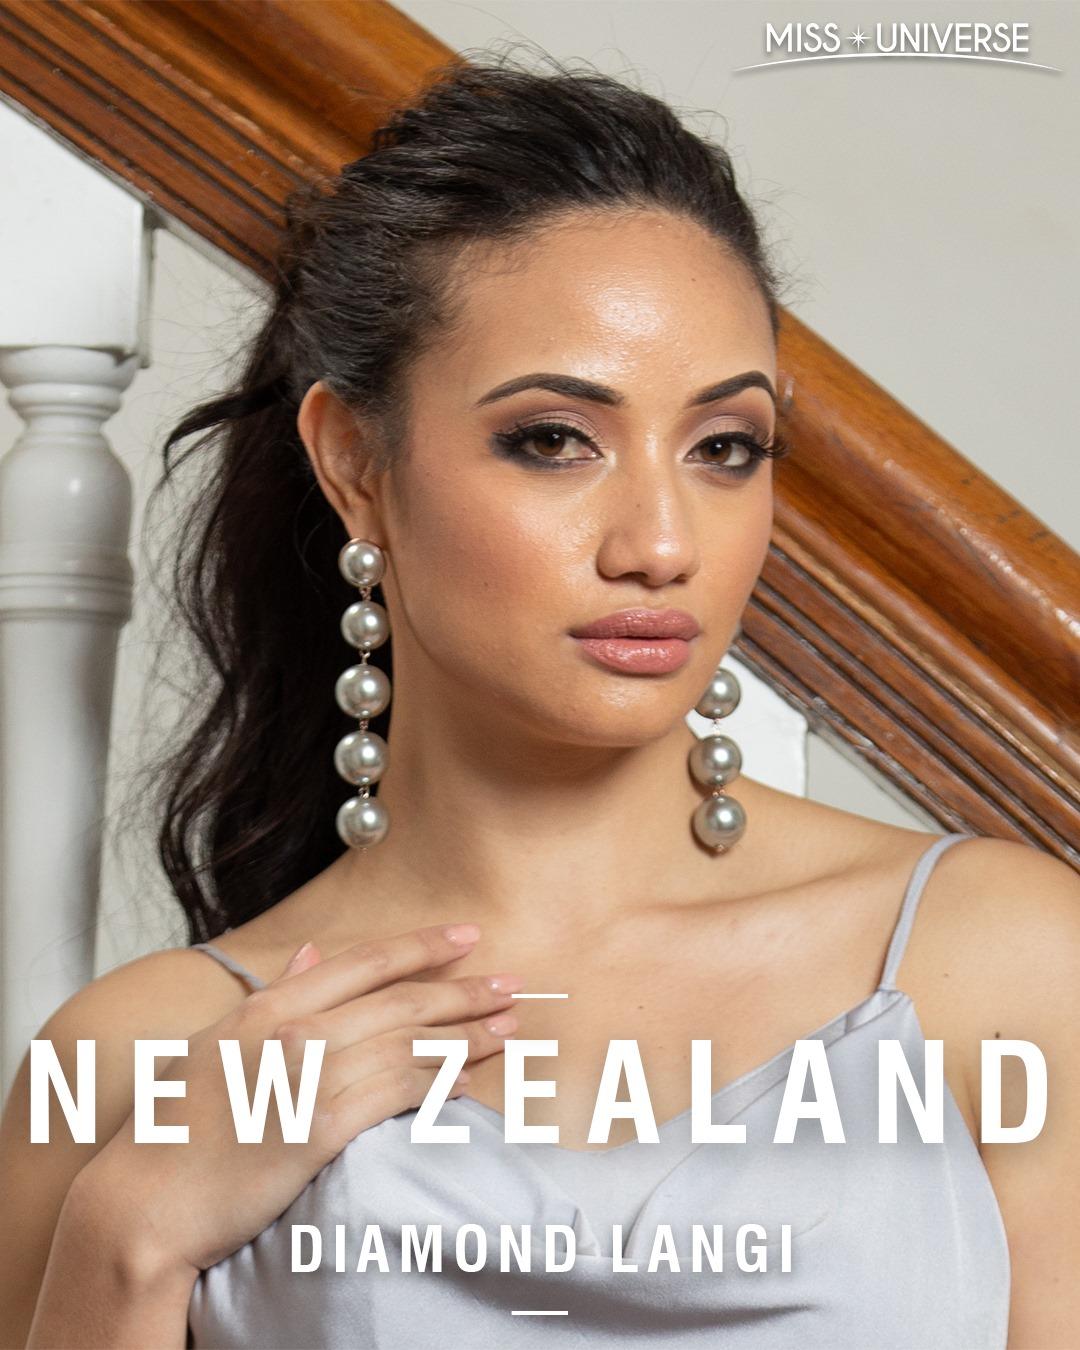 Diamond Langi (TONGA EARTH 2017 & NEW ZEALAND UNIVERSE 2019) 22